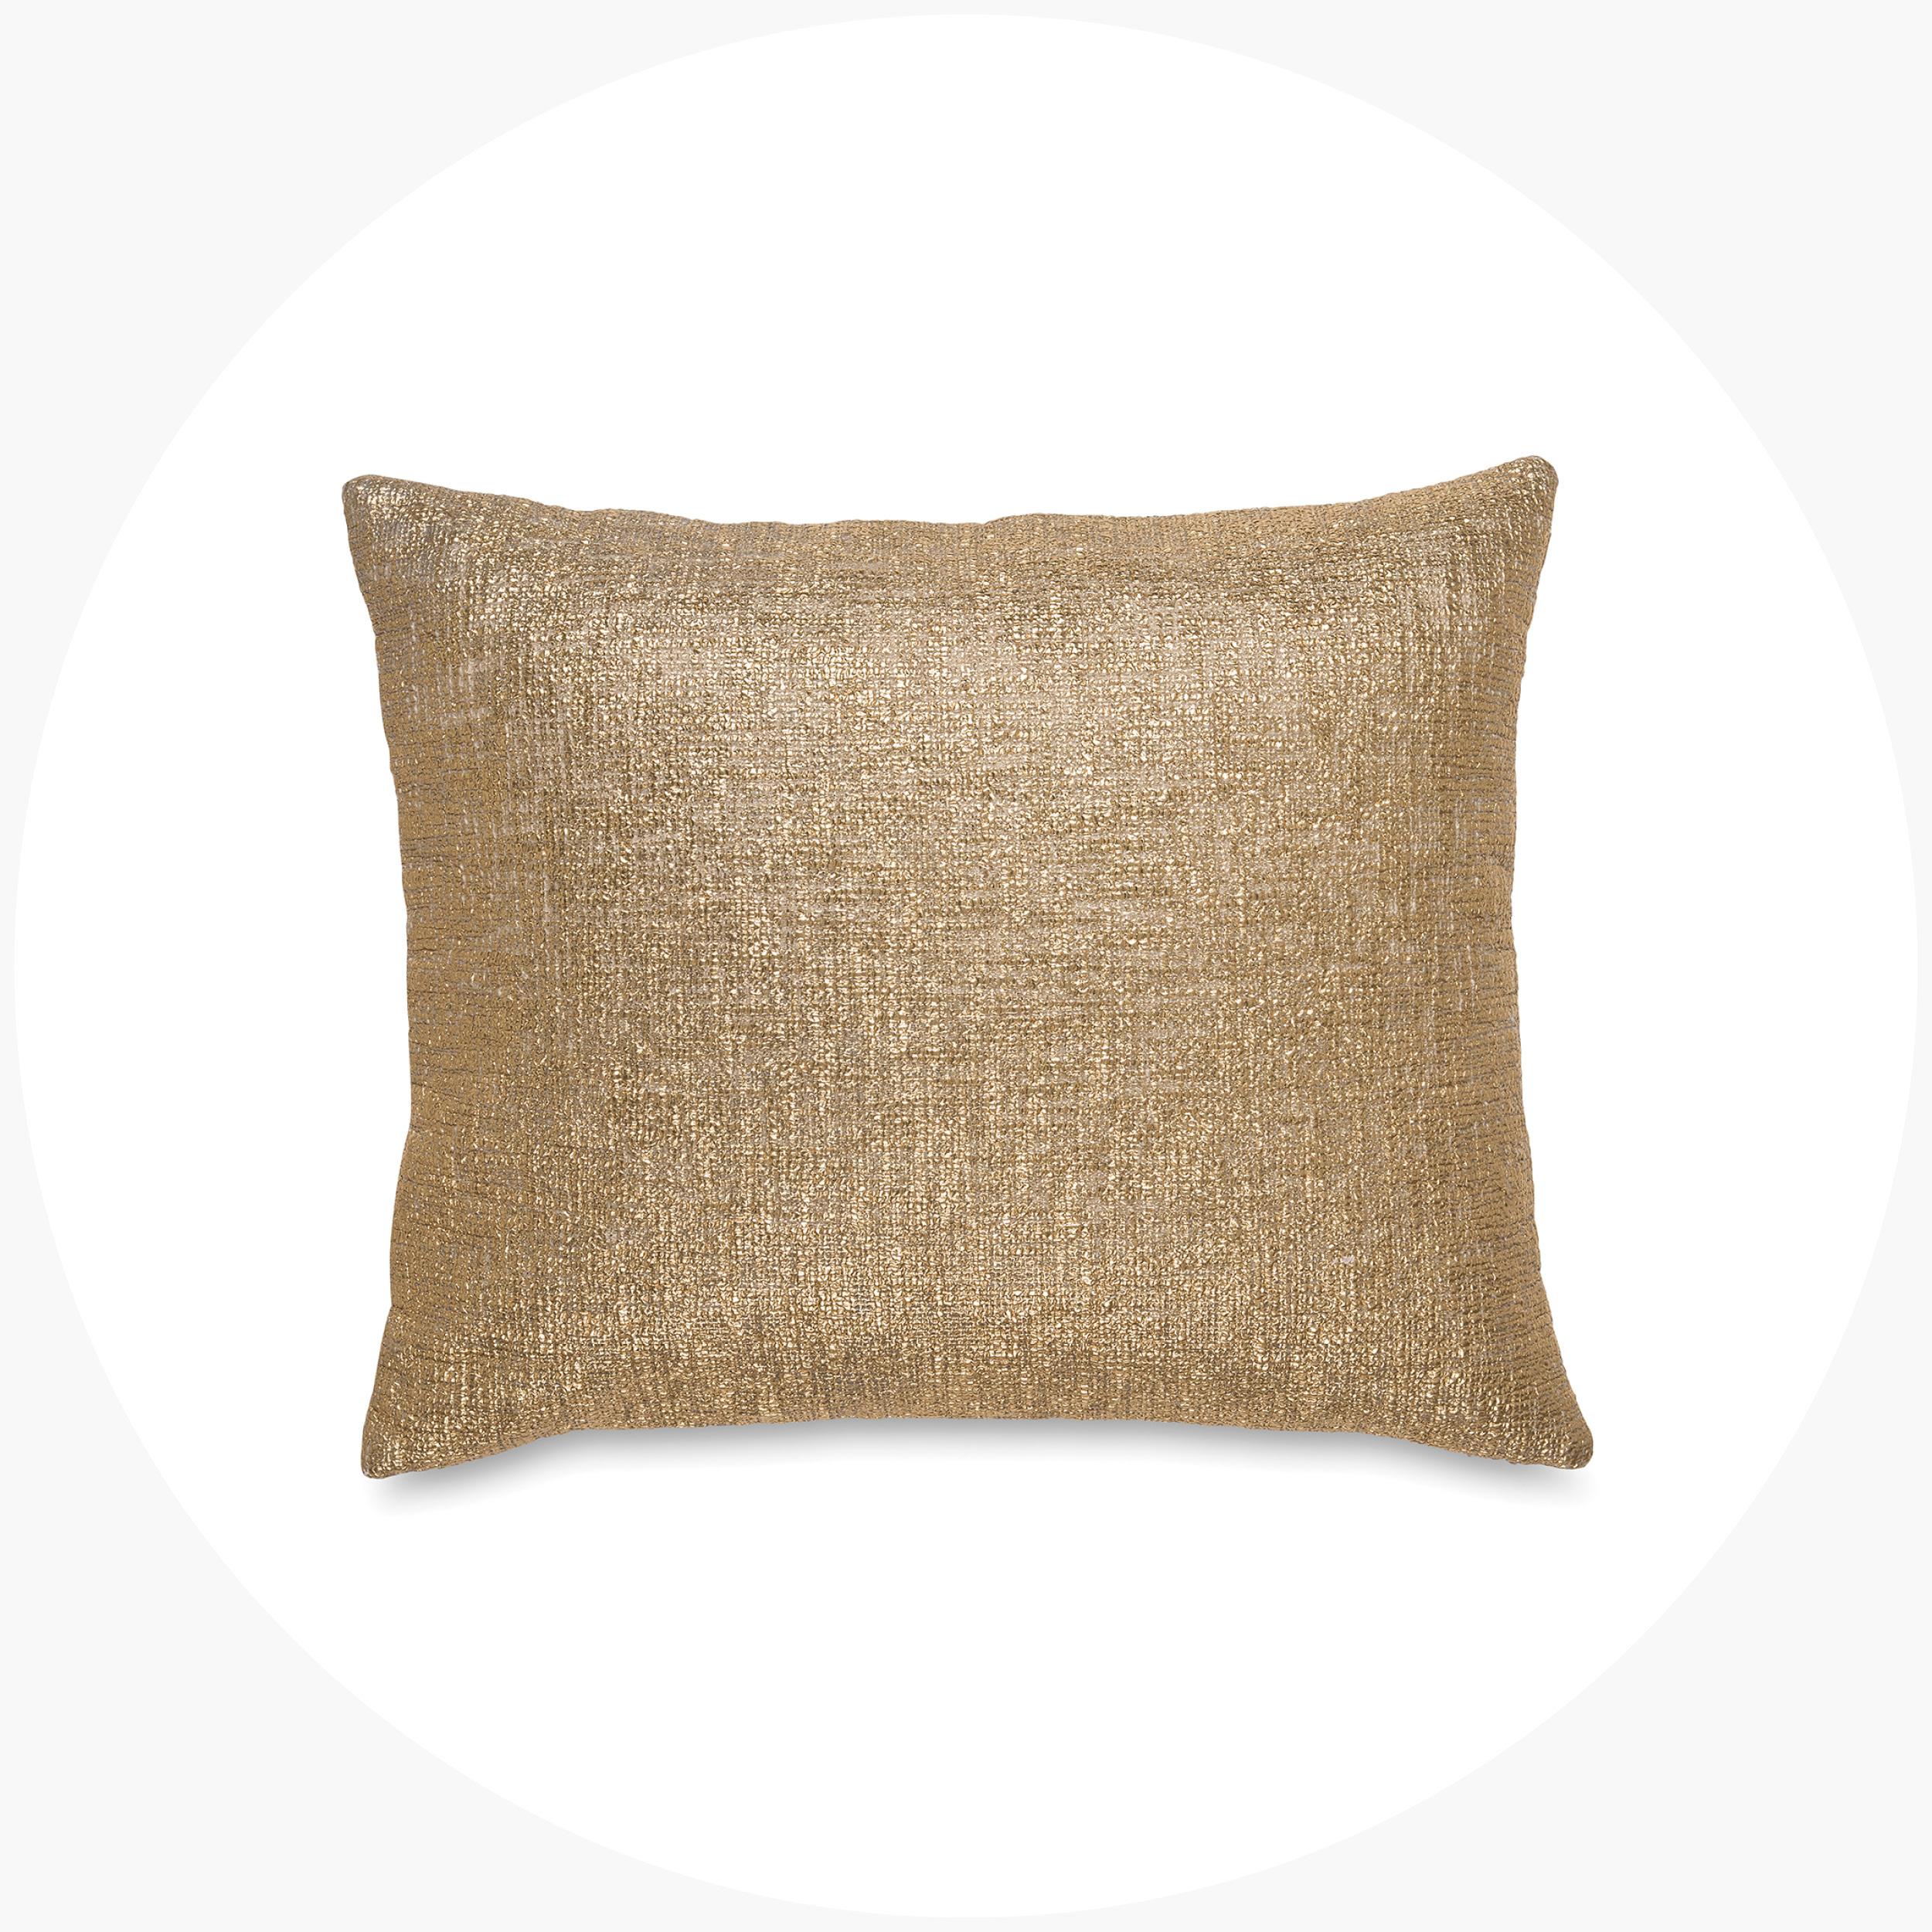 Oro Cushion Cover  $129.00